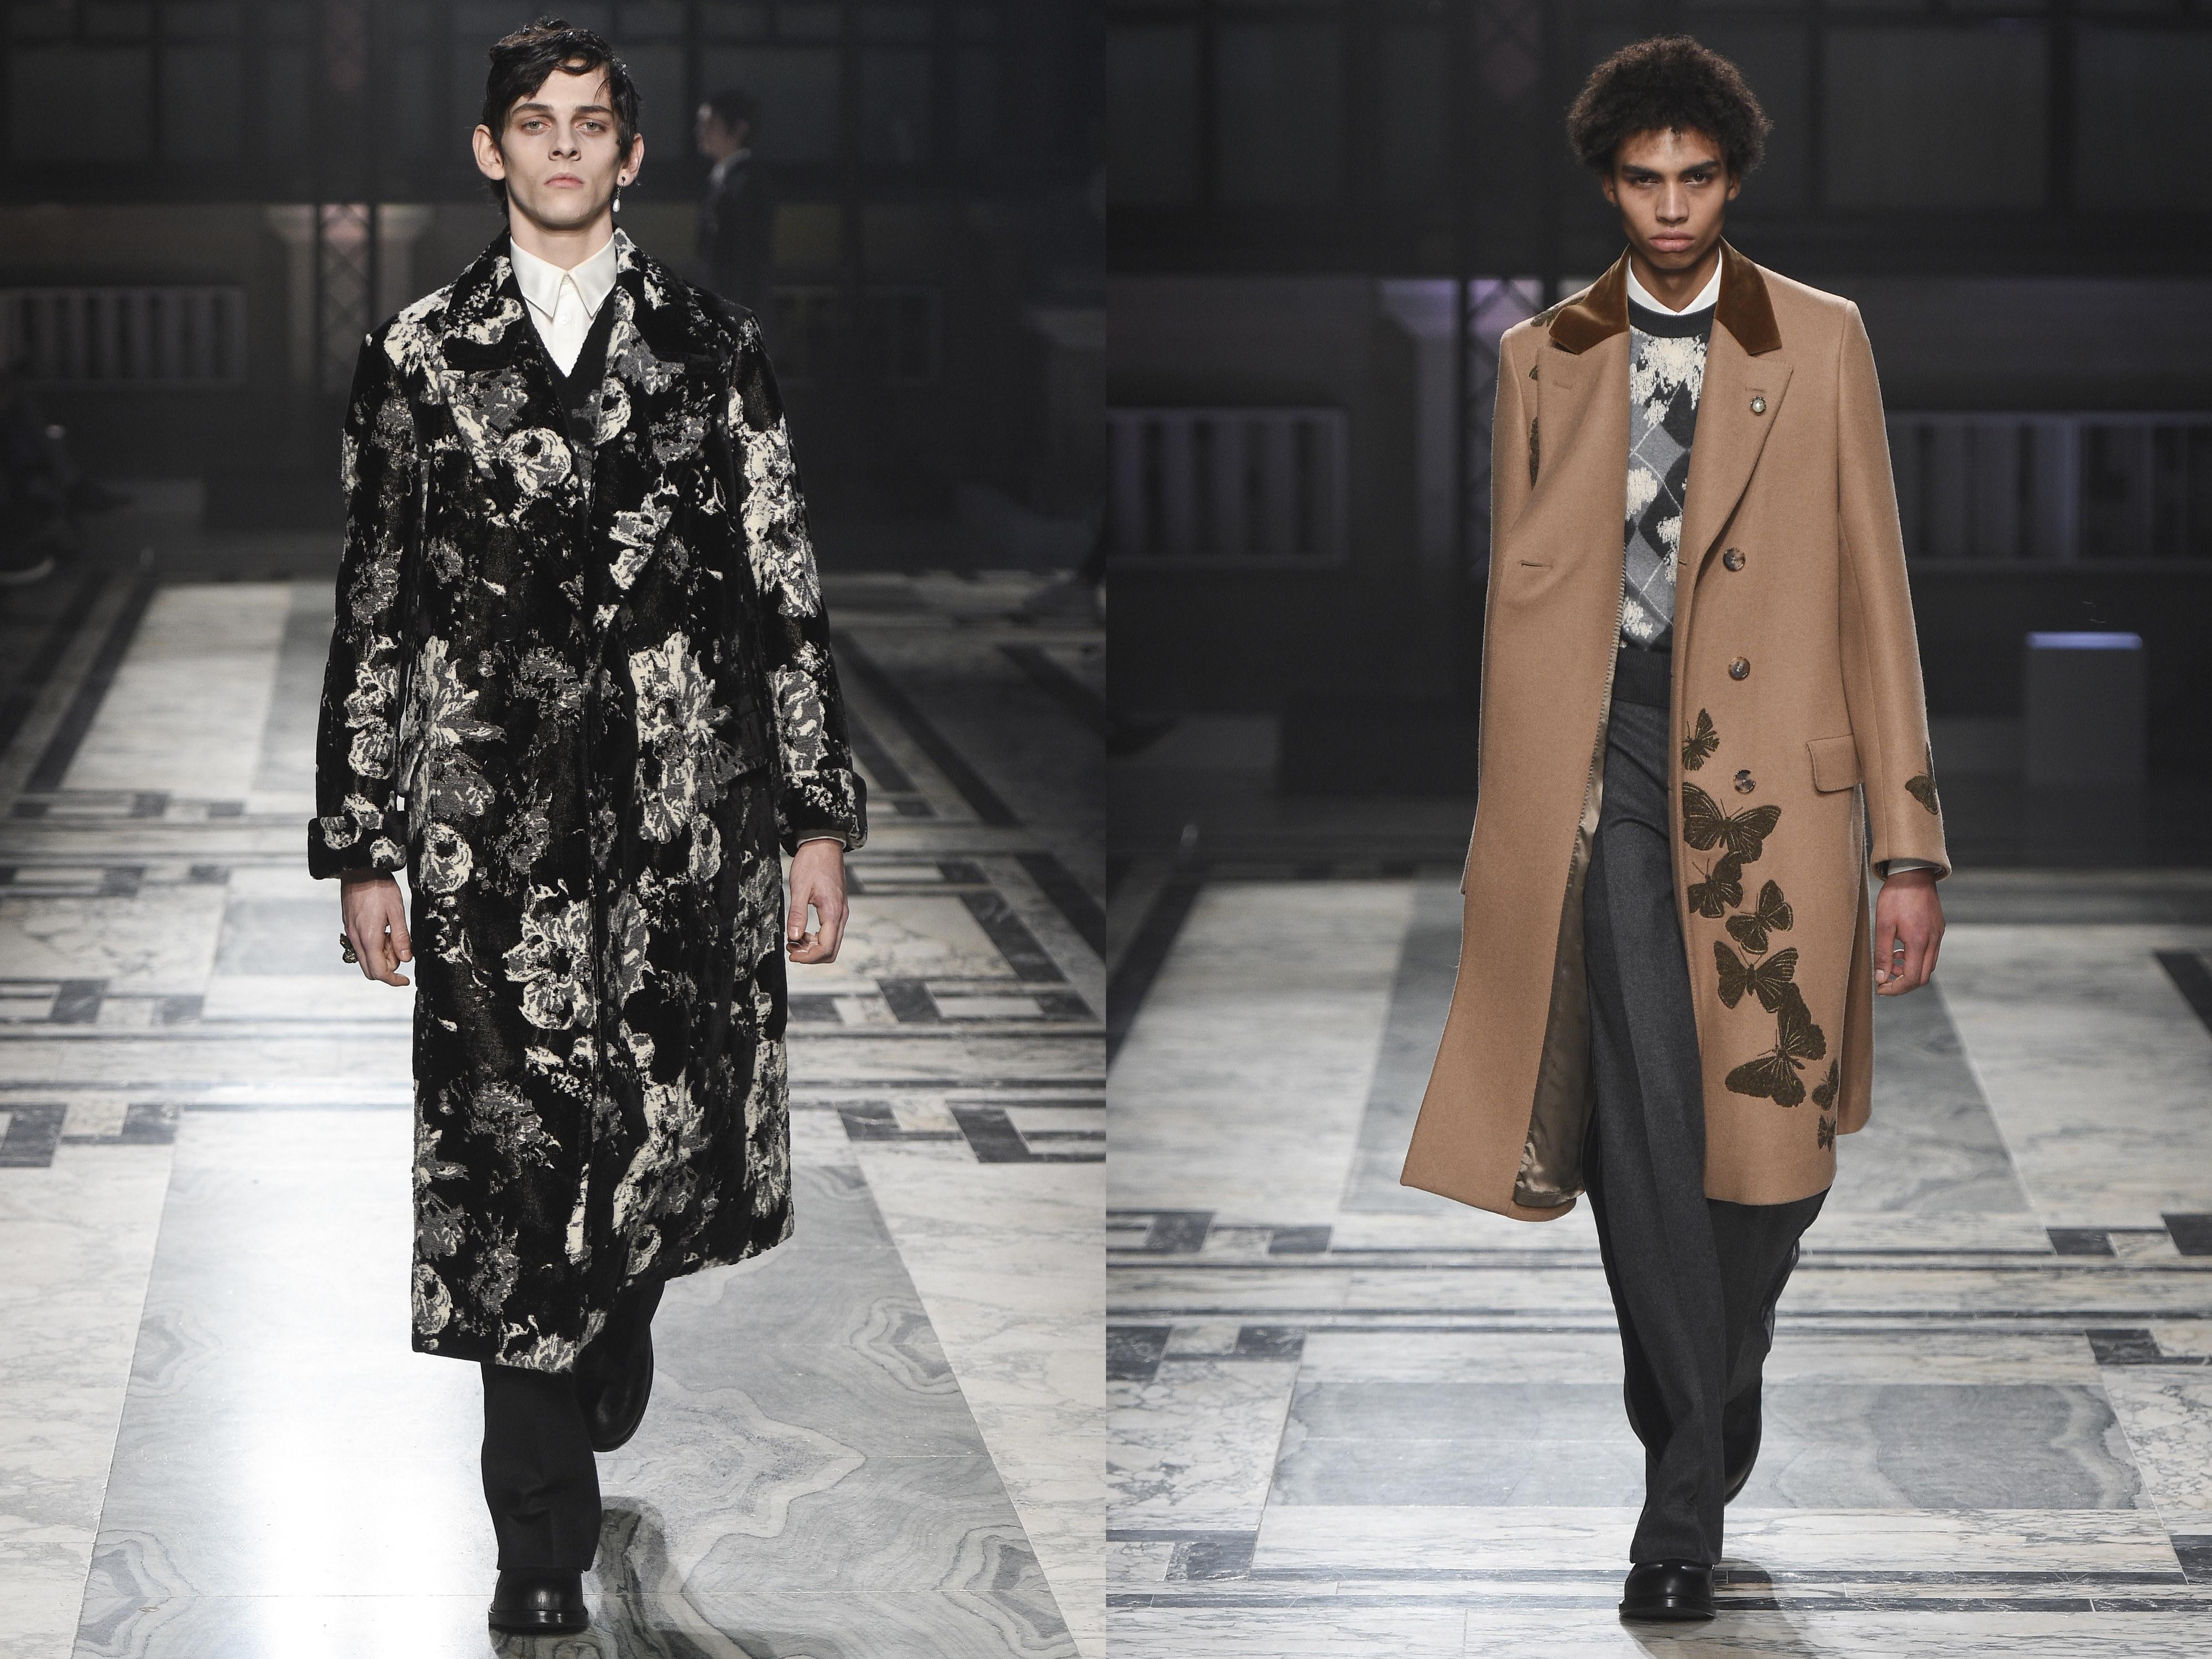 alexander mcqueen, fashion show, london collection, fashion blogger, blog de moda, alex cursino, moda sem censure, review, digital influencer,  (1)